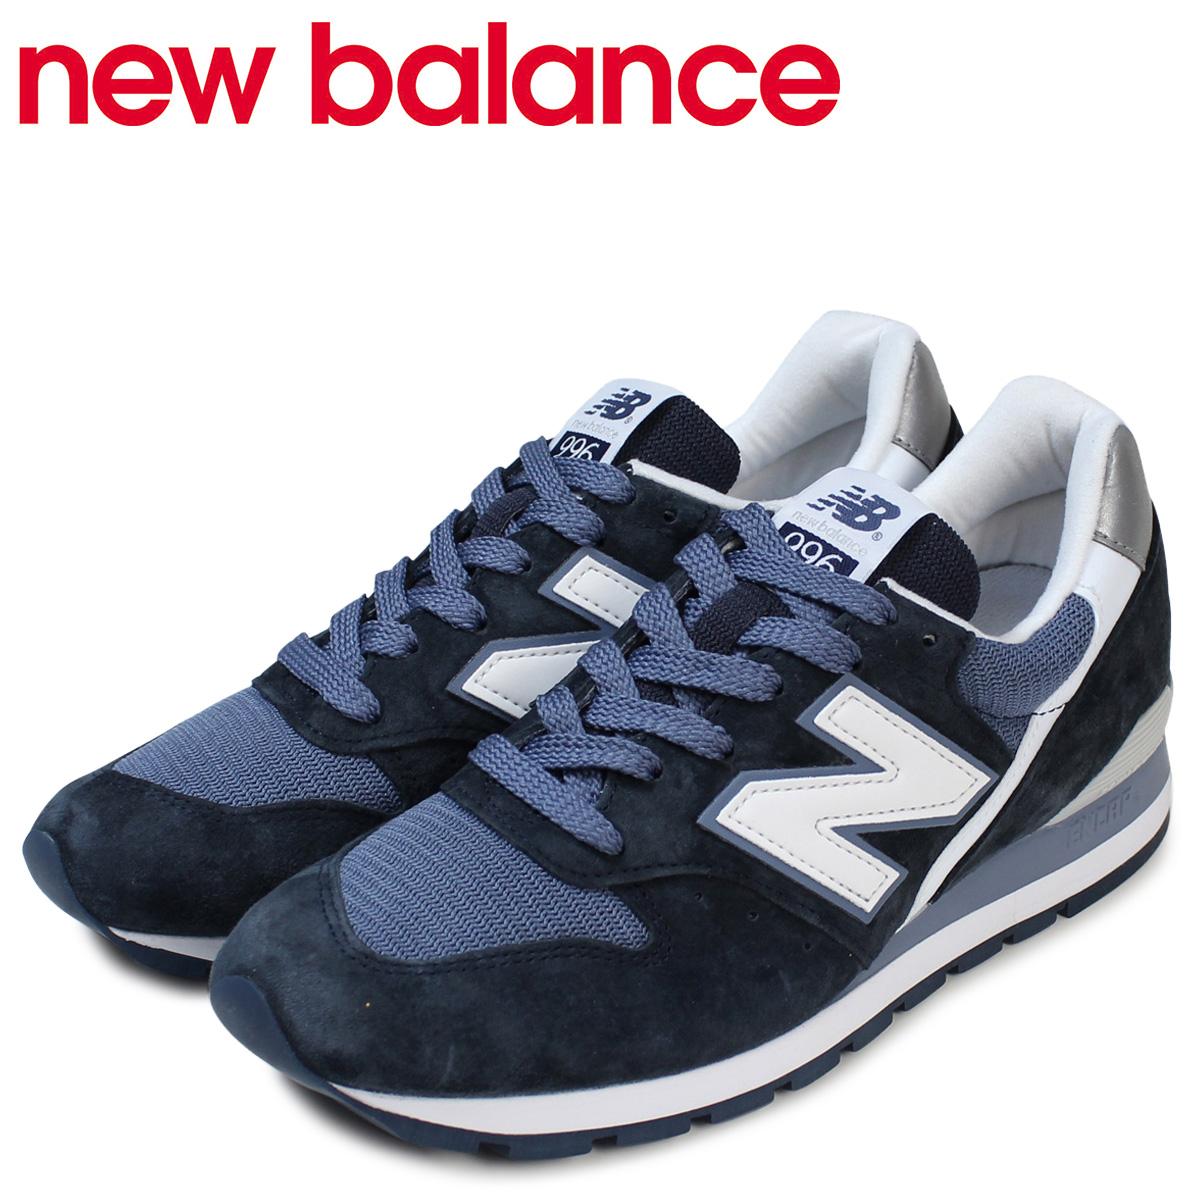 pas cher pour réduction e0b82 ae418 New Balance new balance 996 men's navy sneakers M996CPI D Wise USA